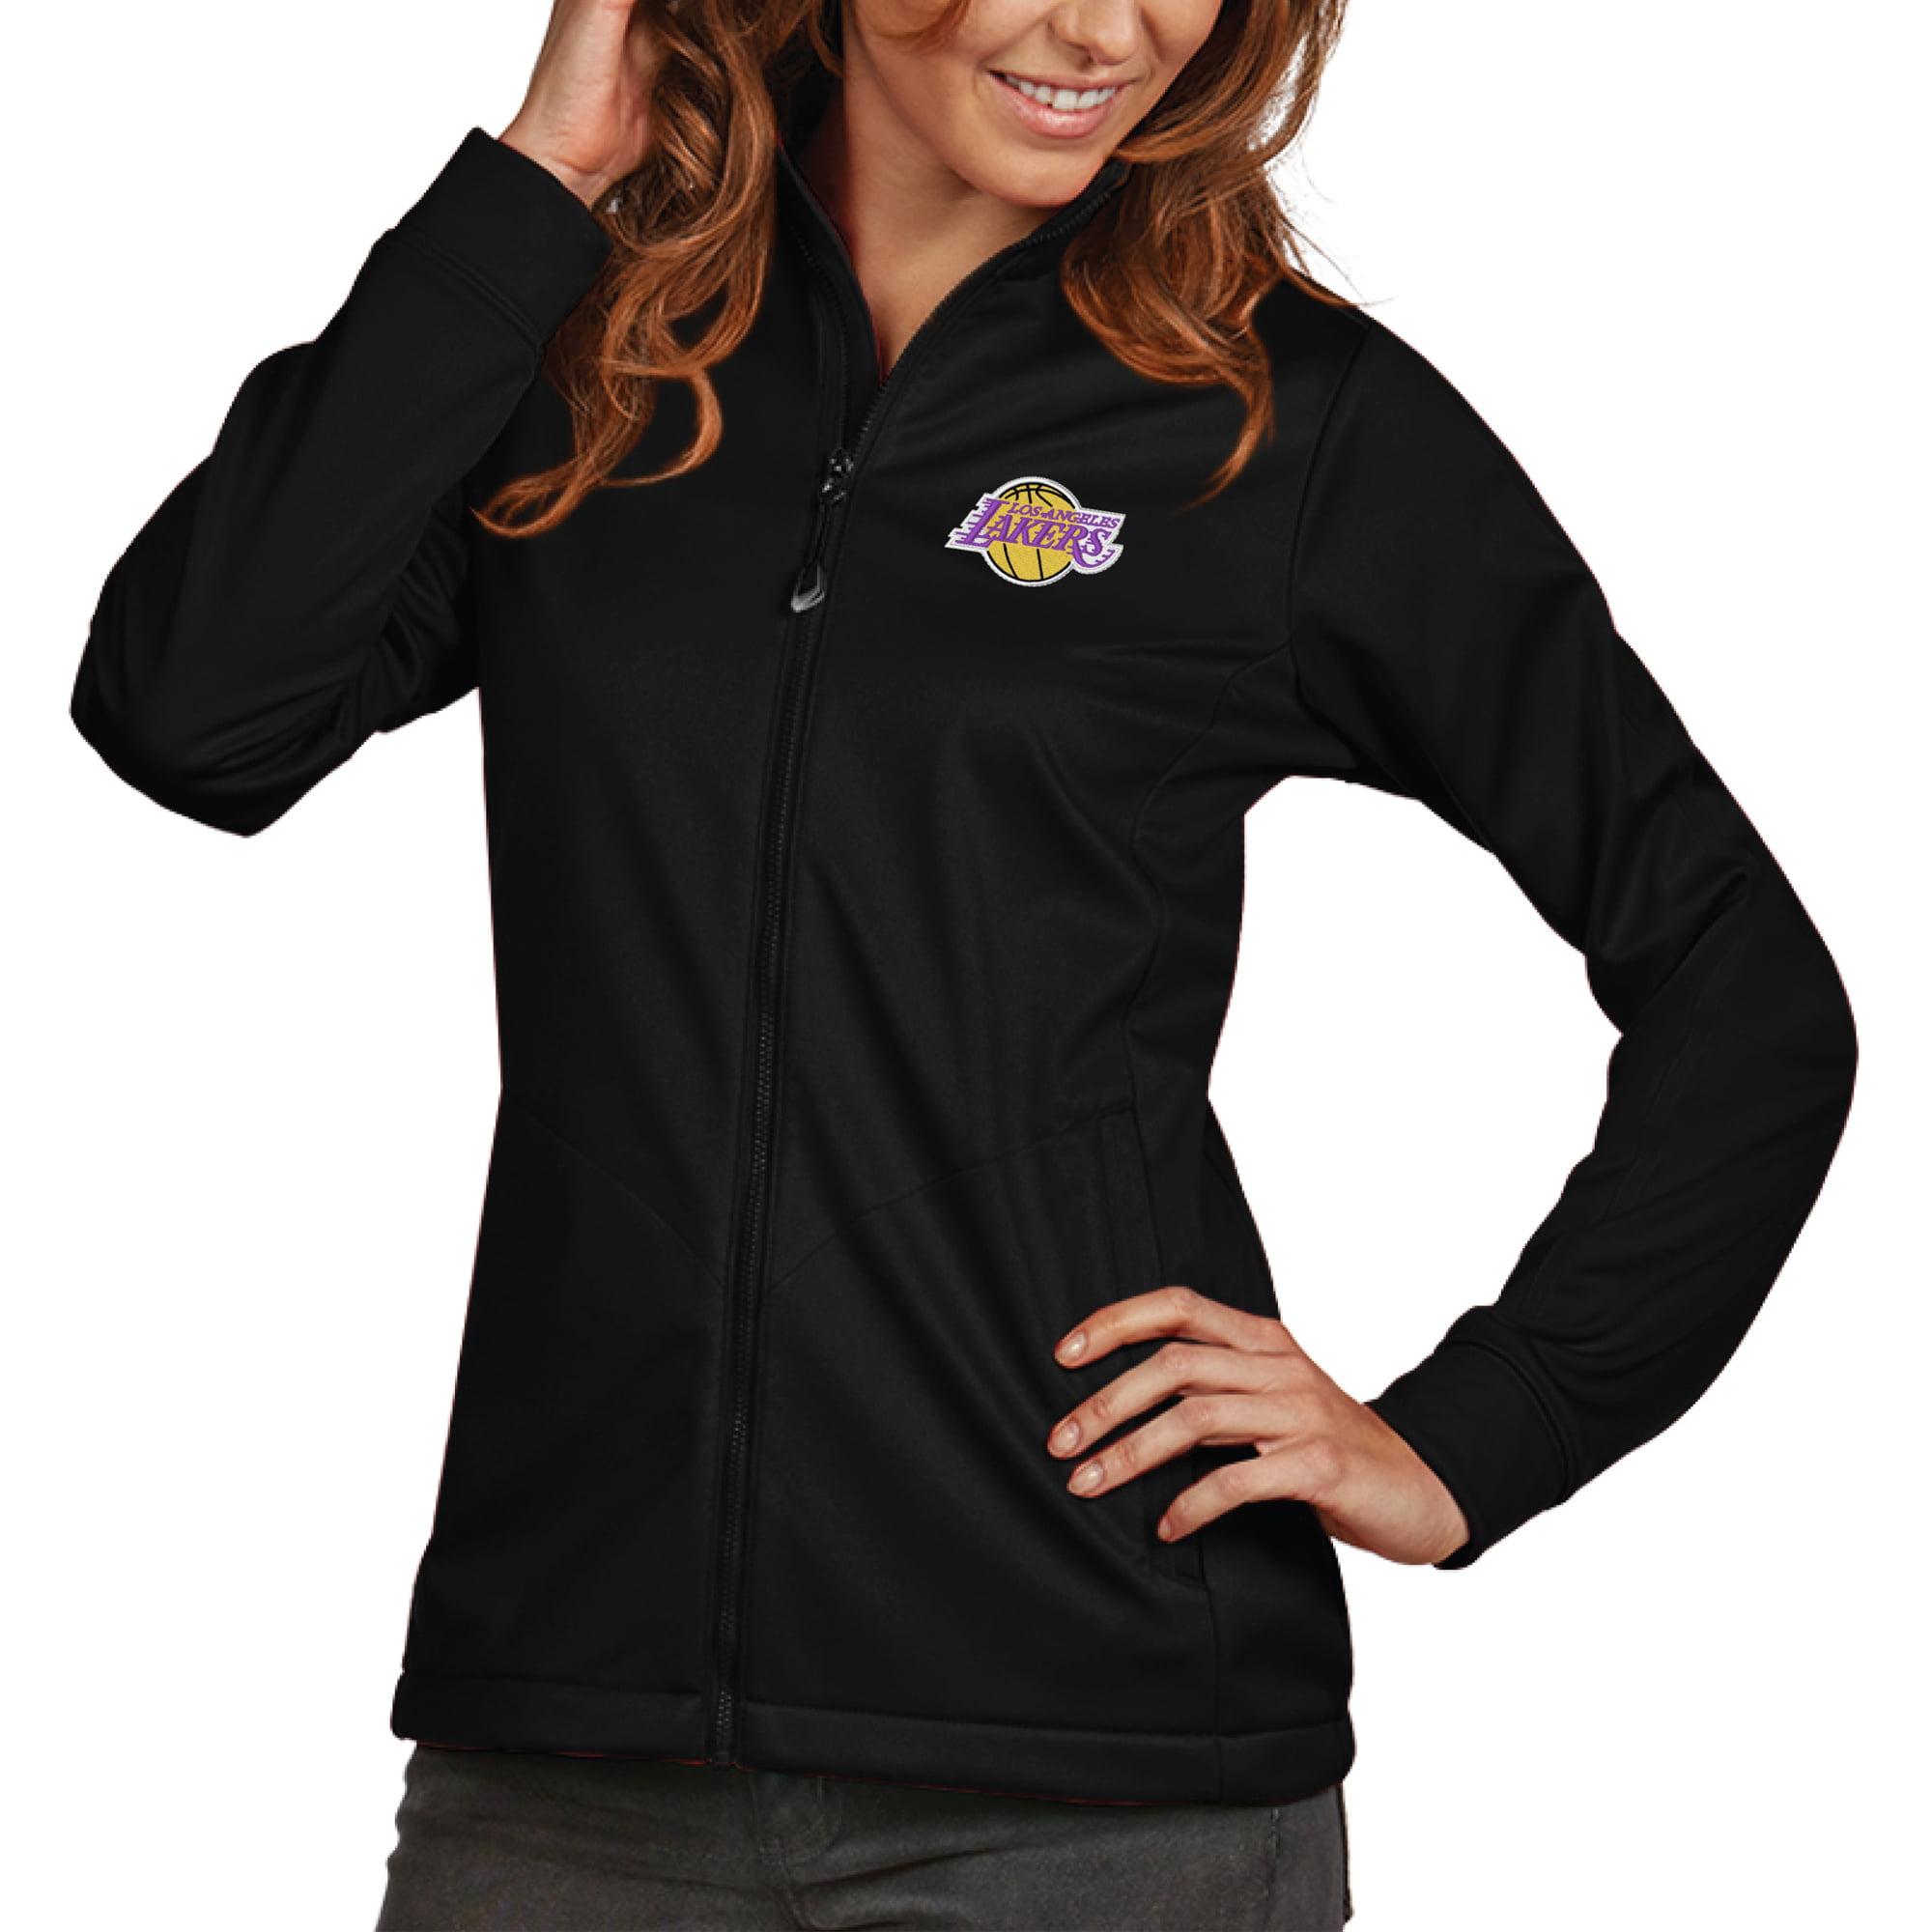 Los Angeles Lakers Antigua Women's Golf Full-Zip Jacket - Black